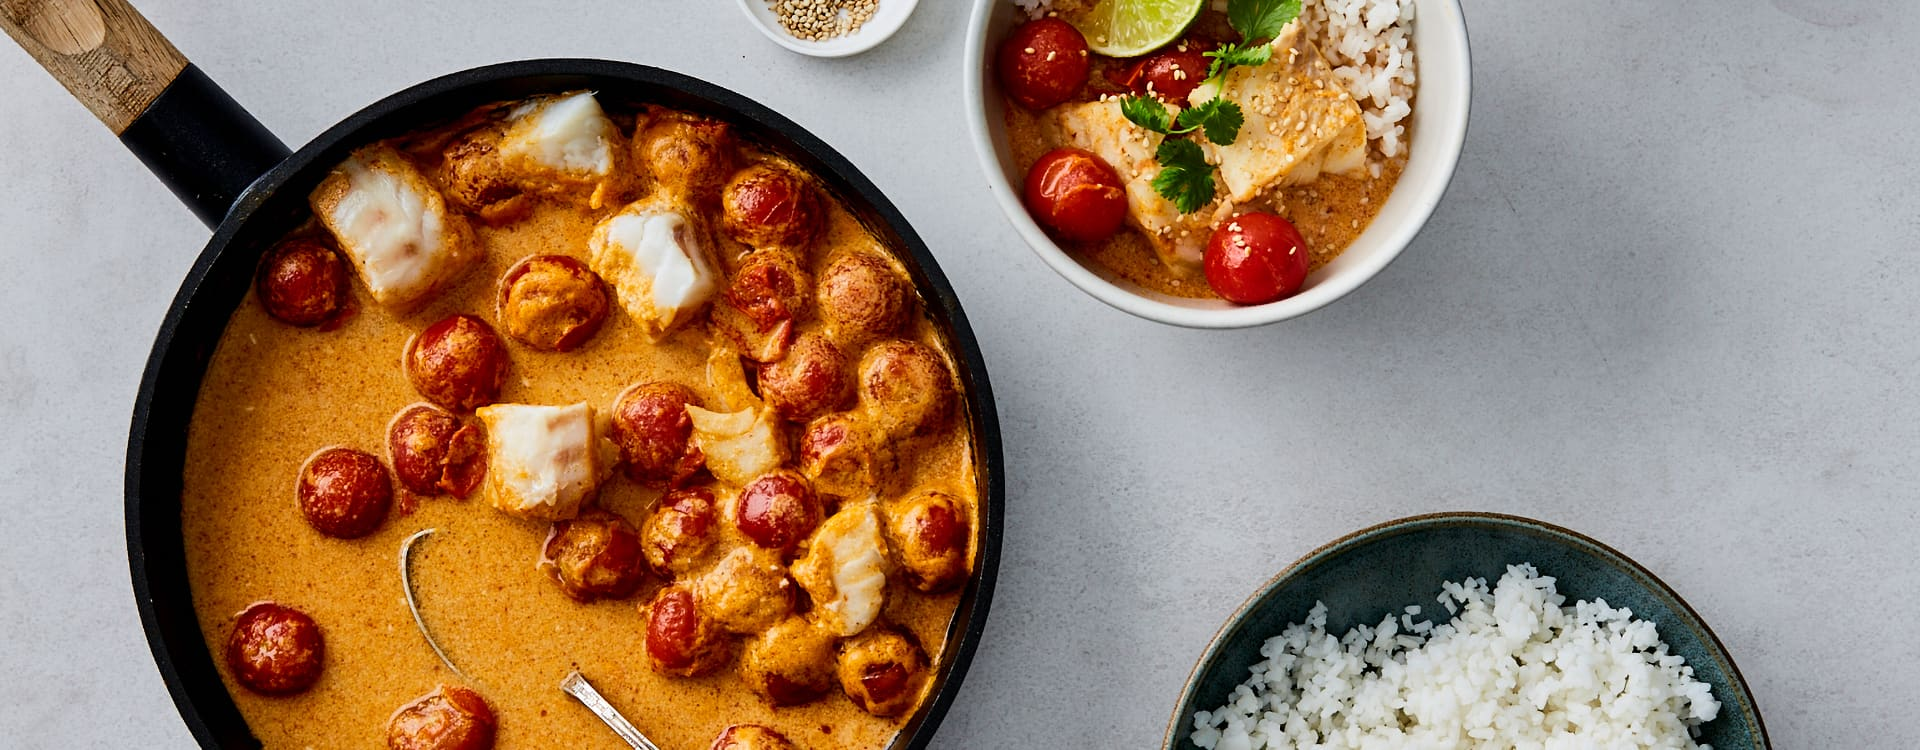 Curry med kokoksmelk er populært. Prøv med torsk neste gang!